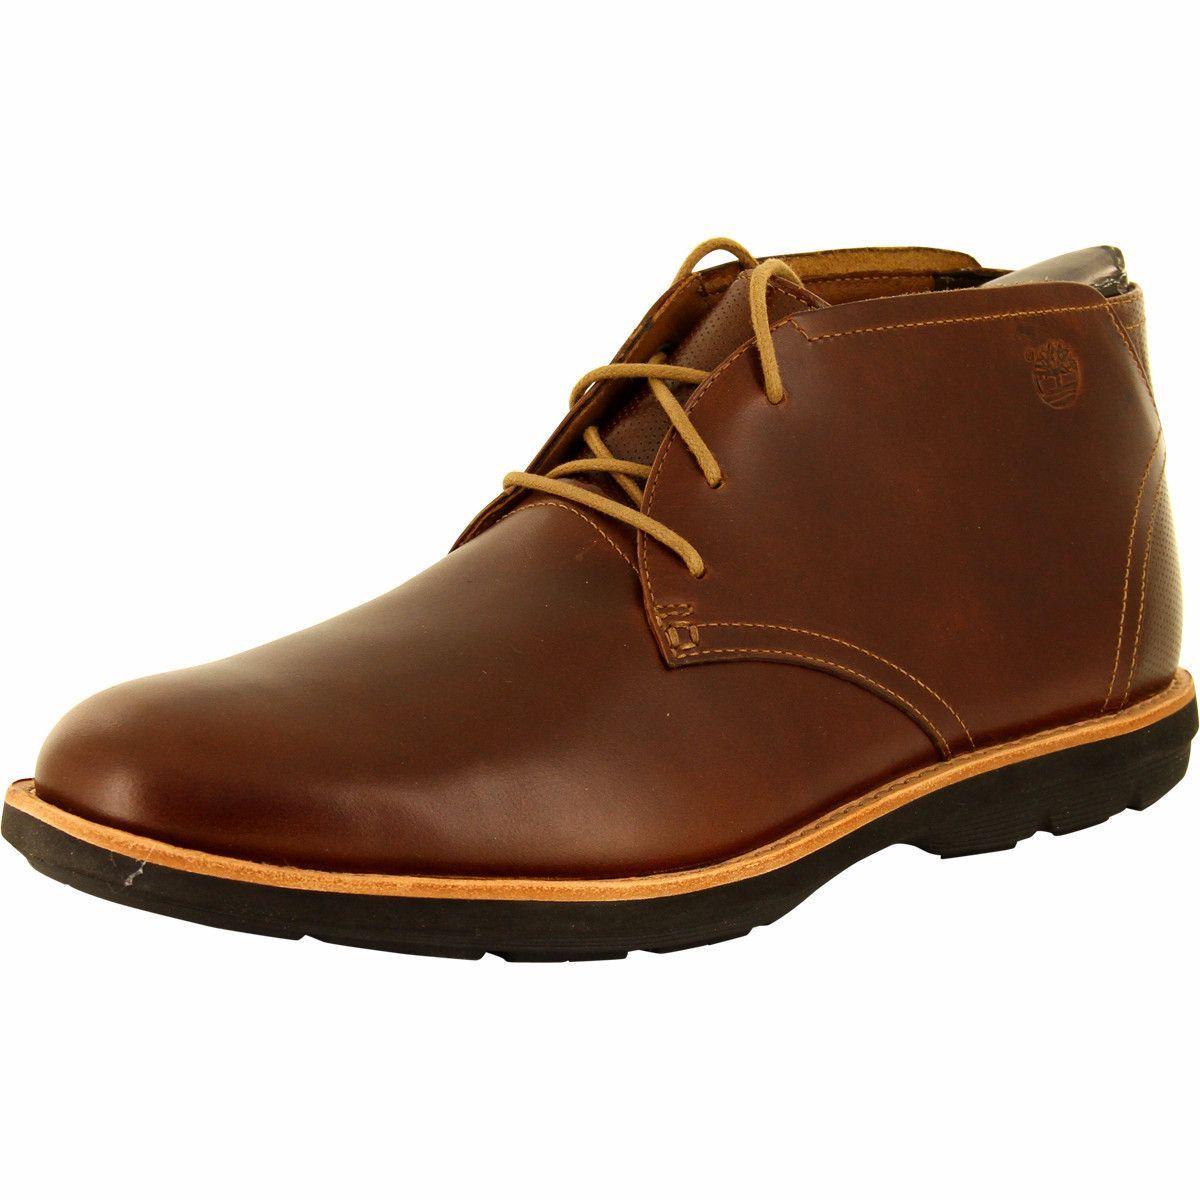 023519410595 Timberland - Men s Earthkeepers Kempton Chukka Boots - Brown Full Grain